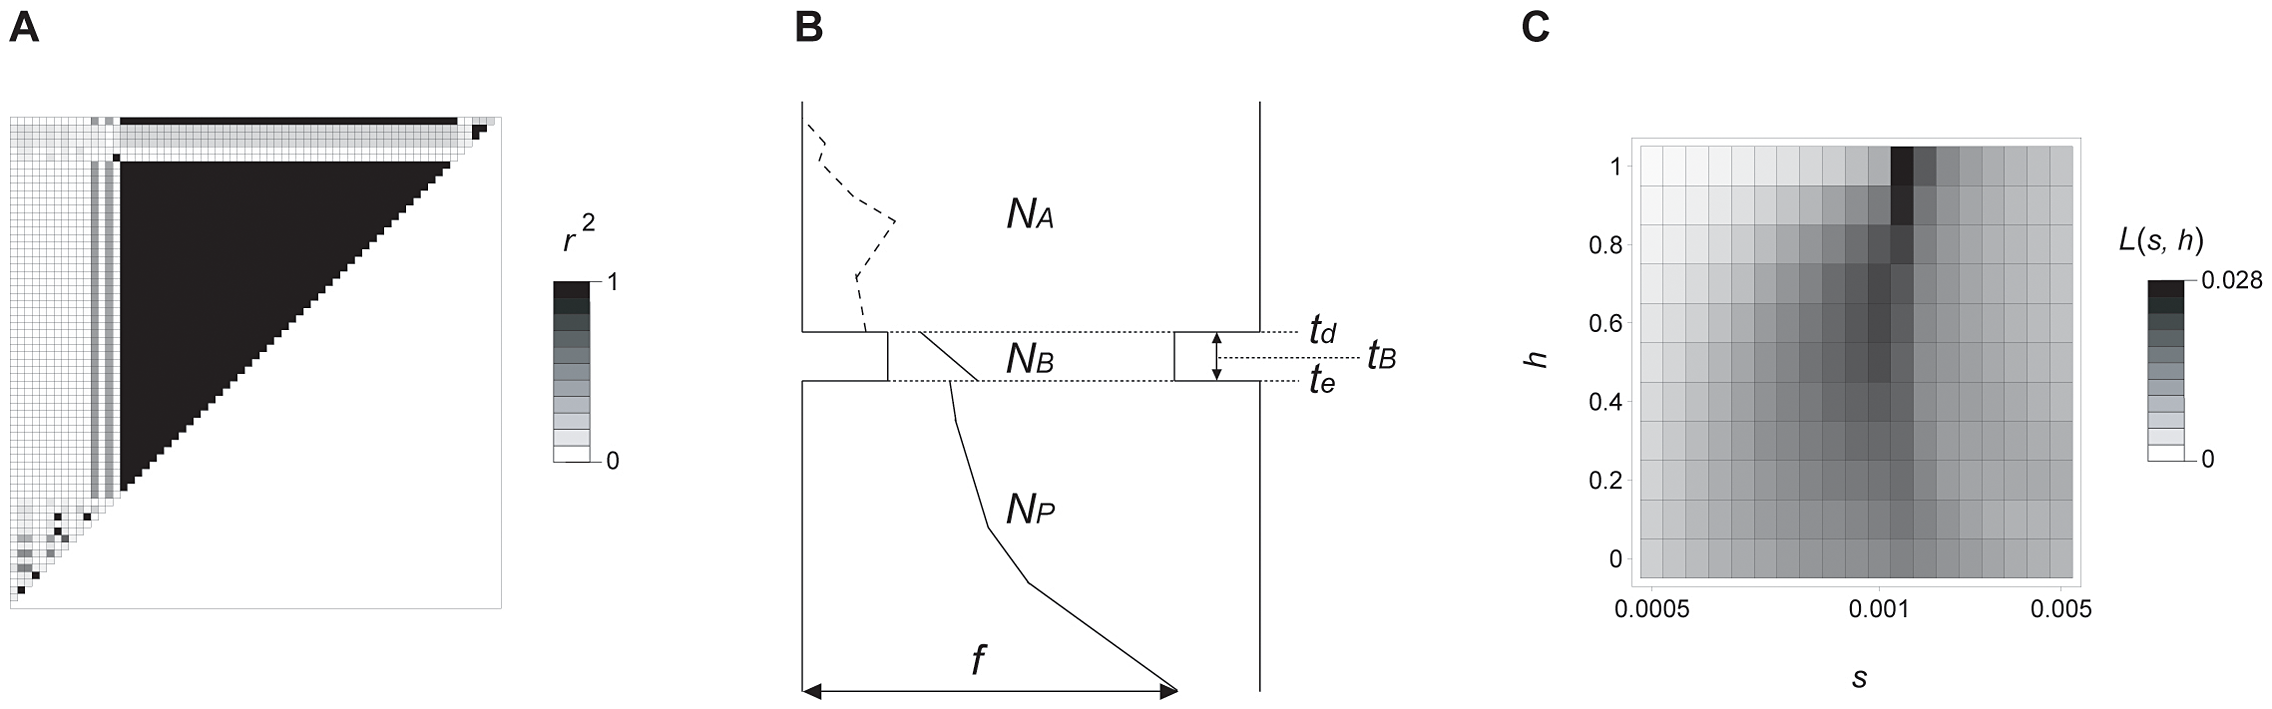 Molecular evolutionary analysis of <i>prol1.1</i>.